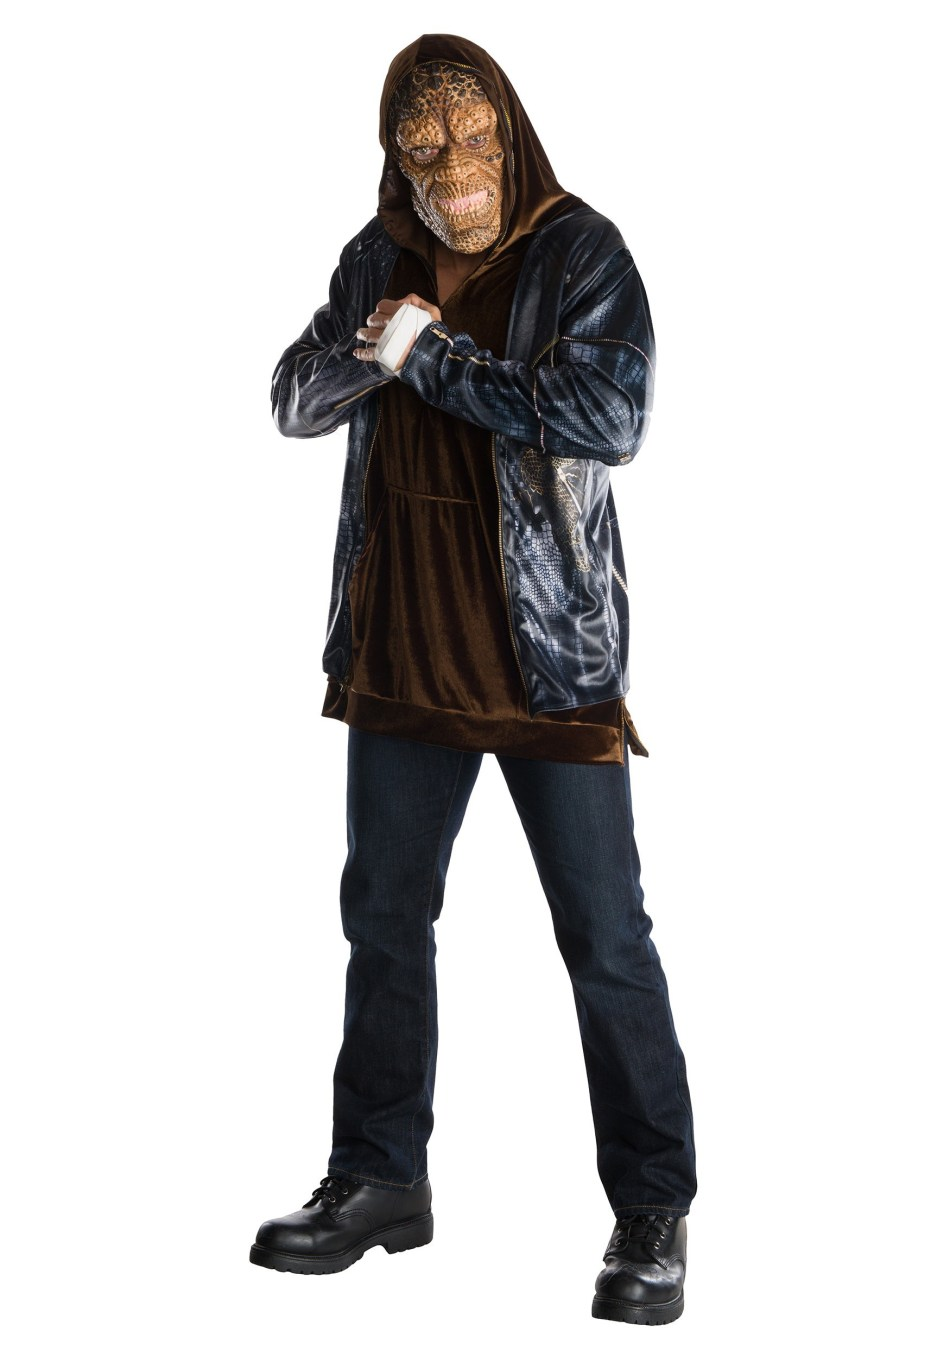 Deluxe Suicide Squad Killer Croc Costume - $59.99